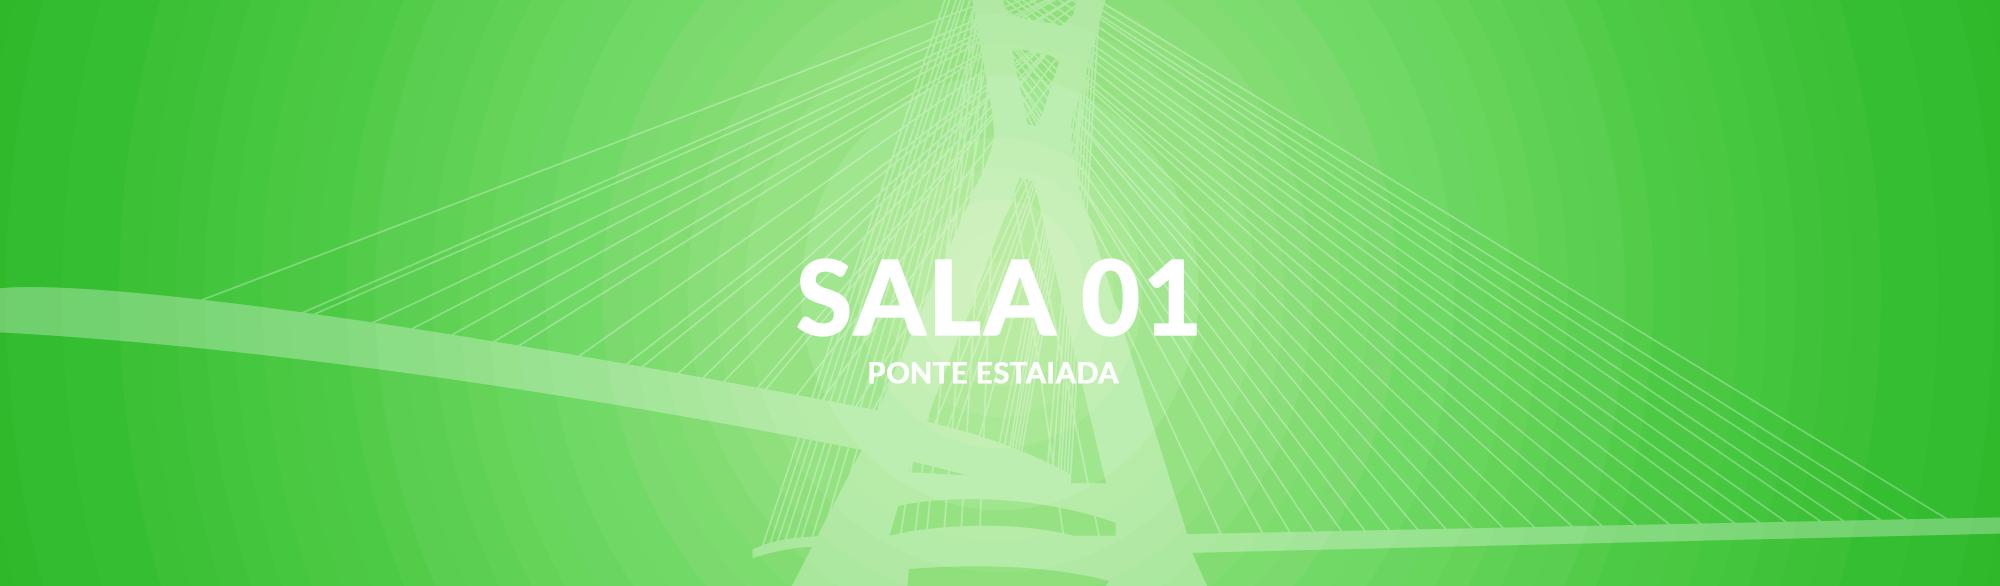 Banner dia03 sala01